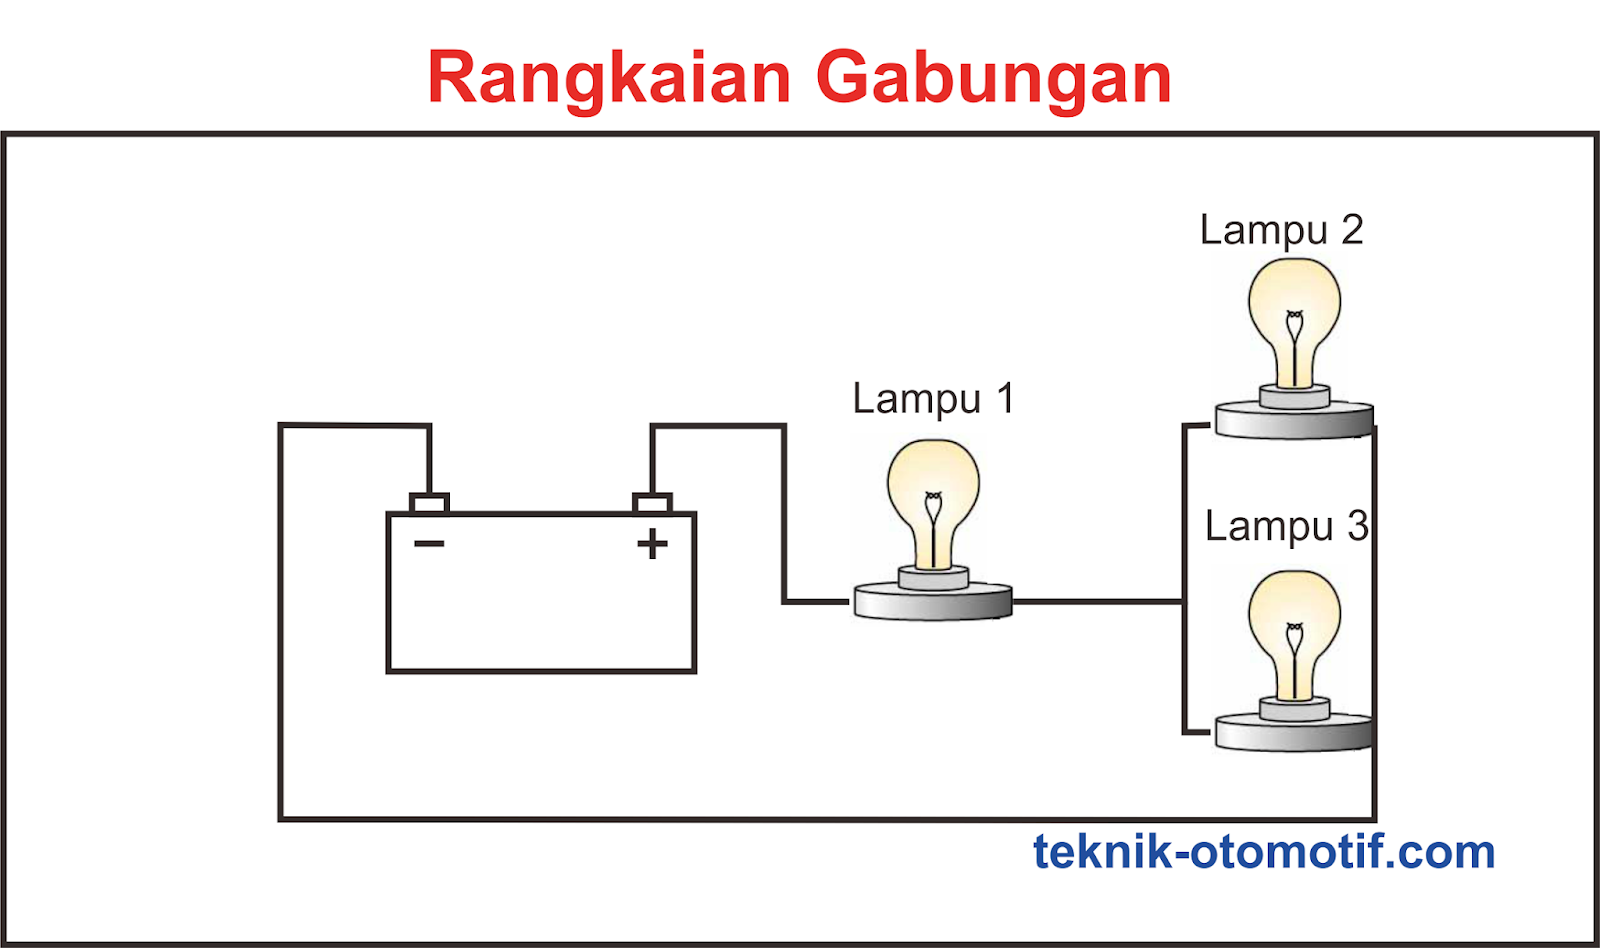 Contoh Soal Dan Contoh Pidato Lengkap Gambar Rangkaian Listrik Paralel 3 Lampu